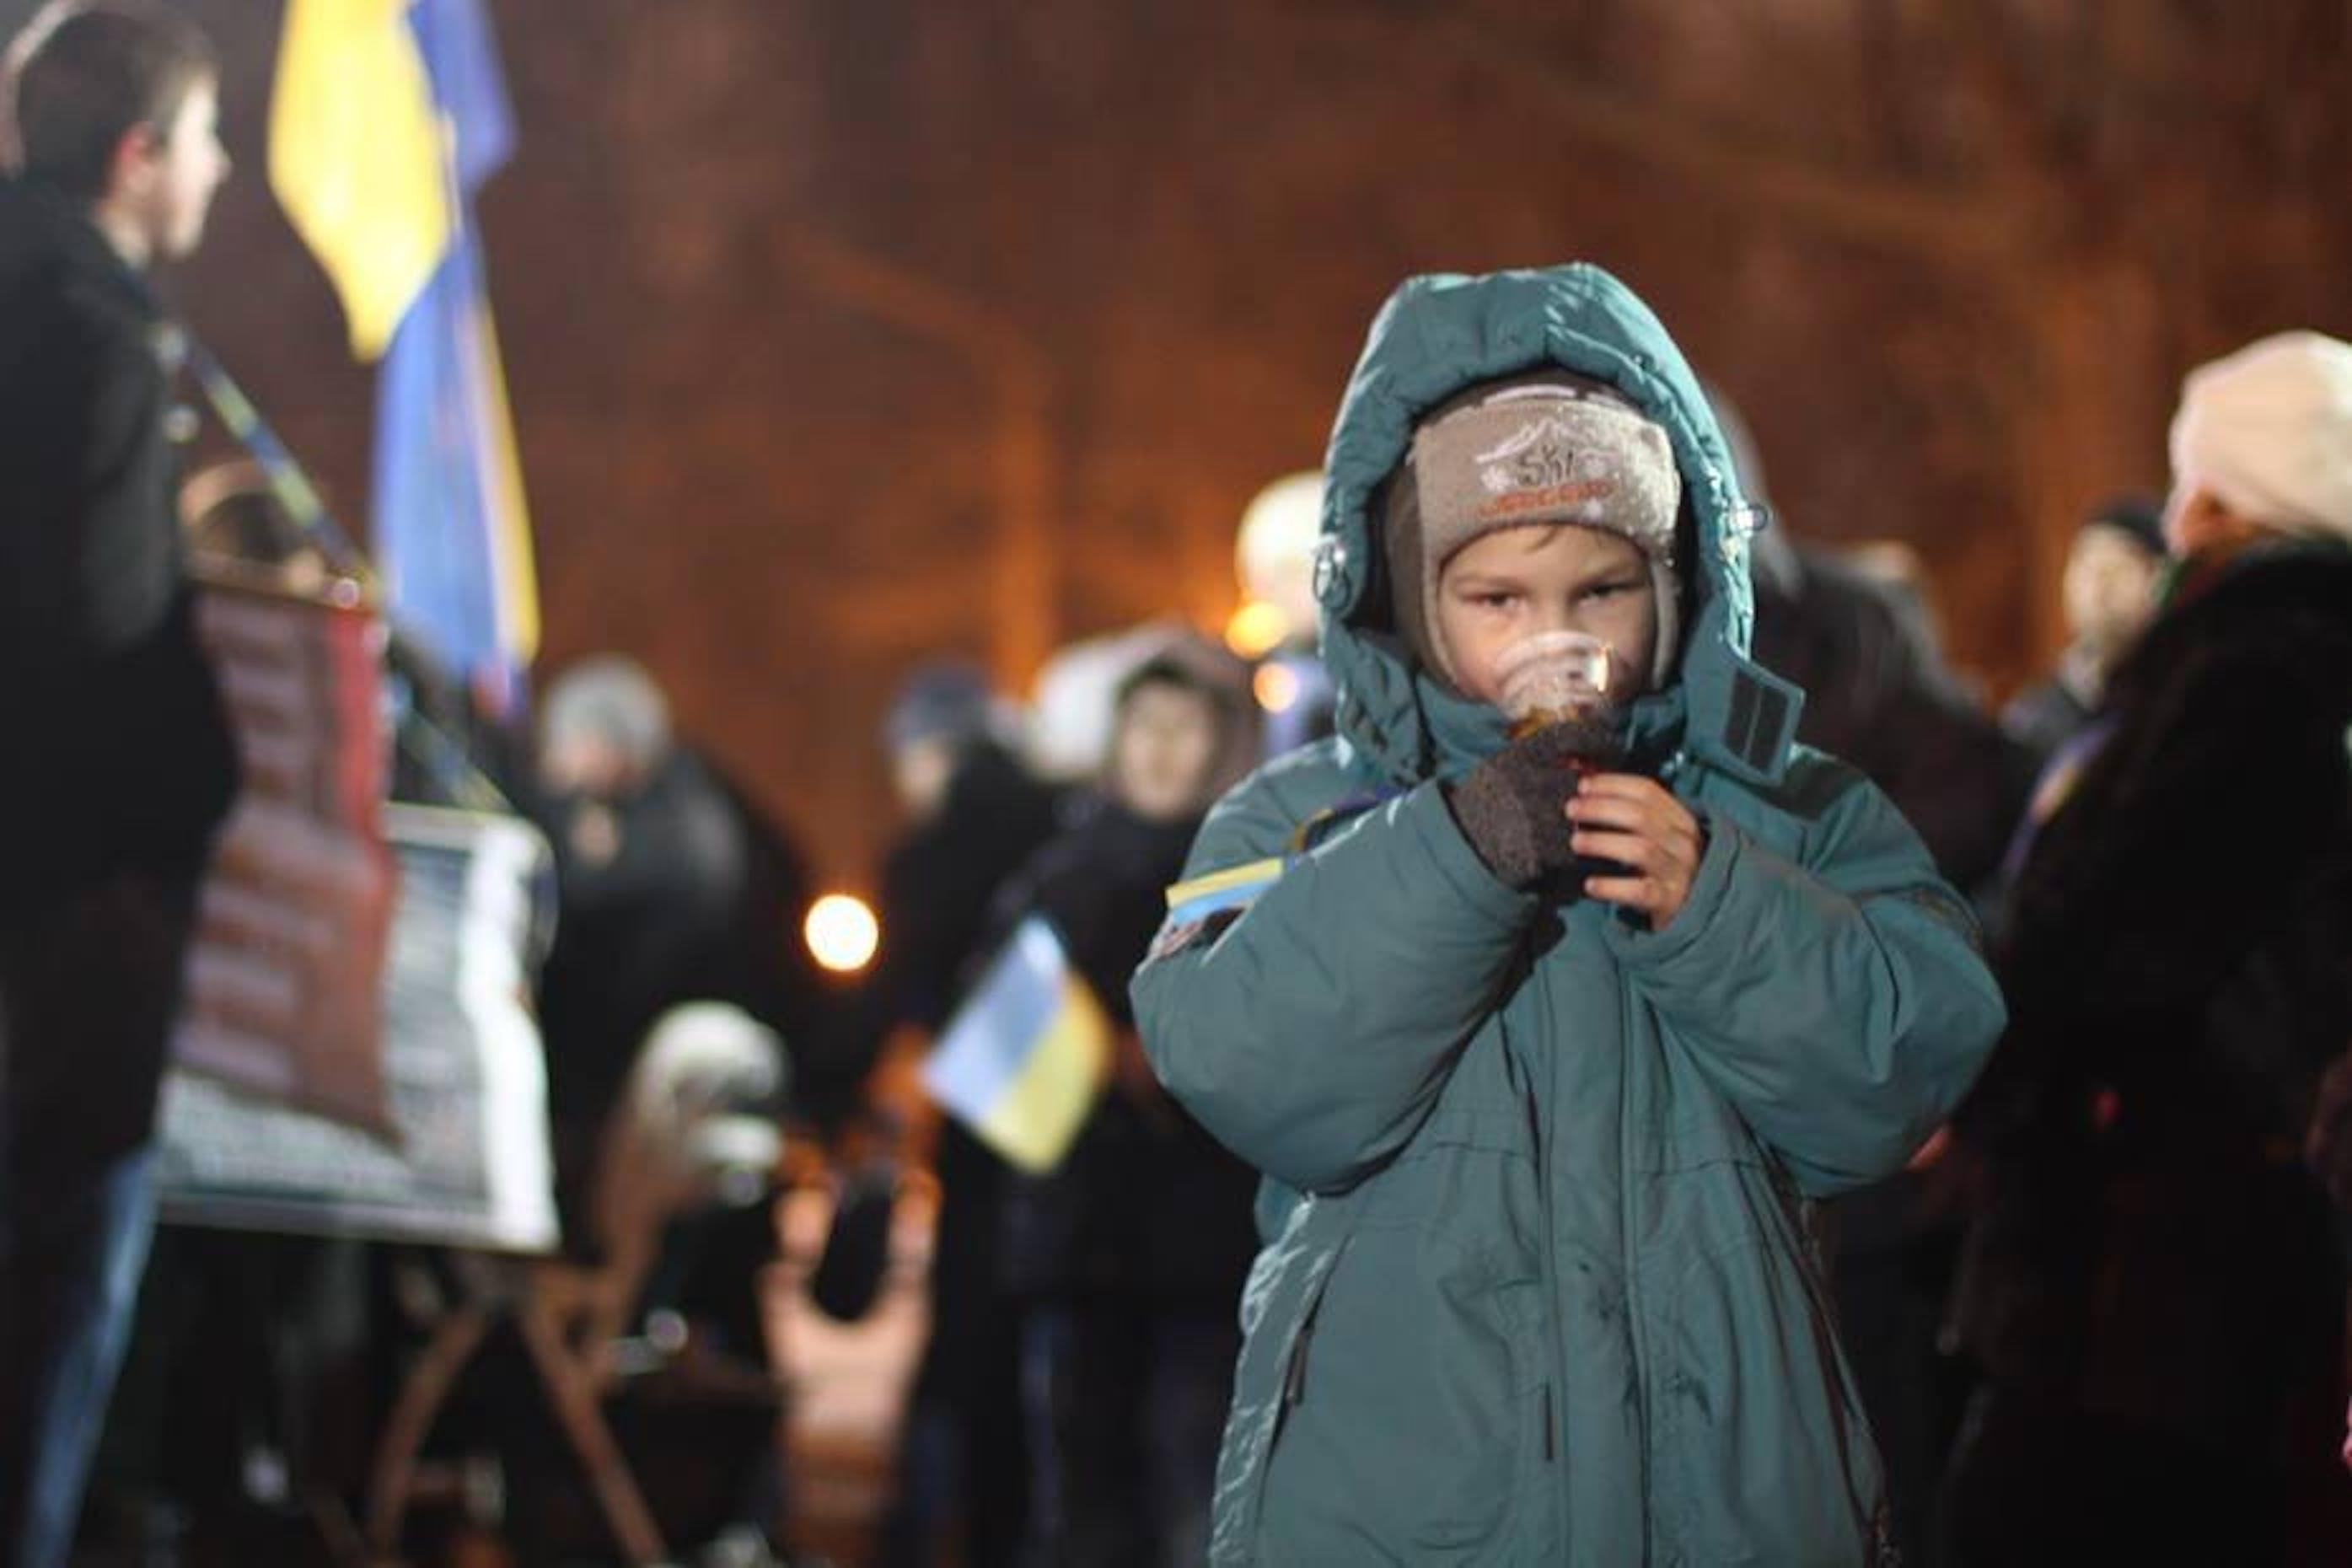 Un bambino in piazza Maidan a Kiev - ©UNICEF Ucraina/2014